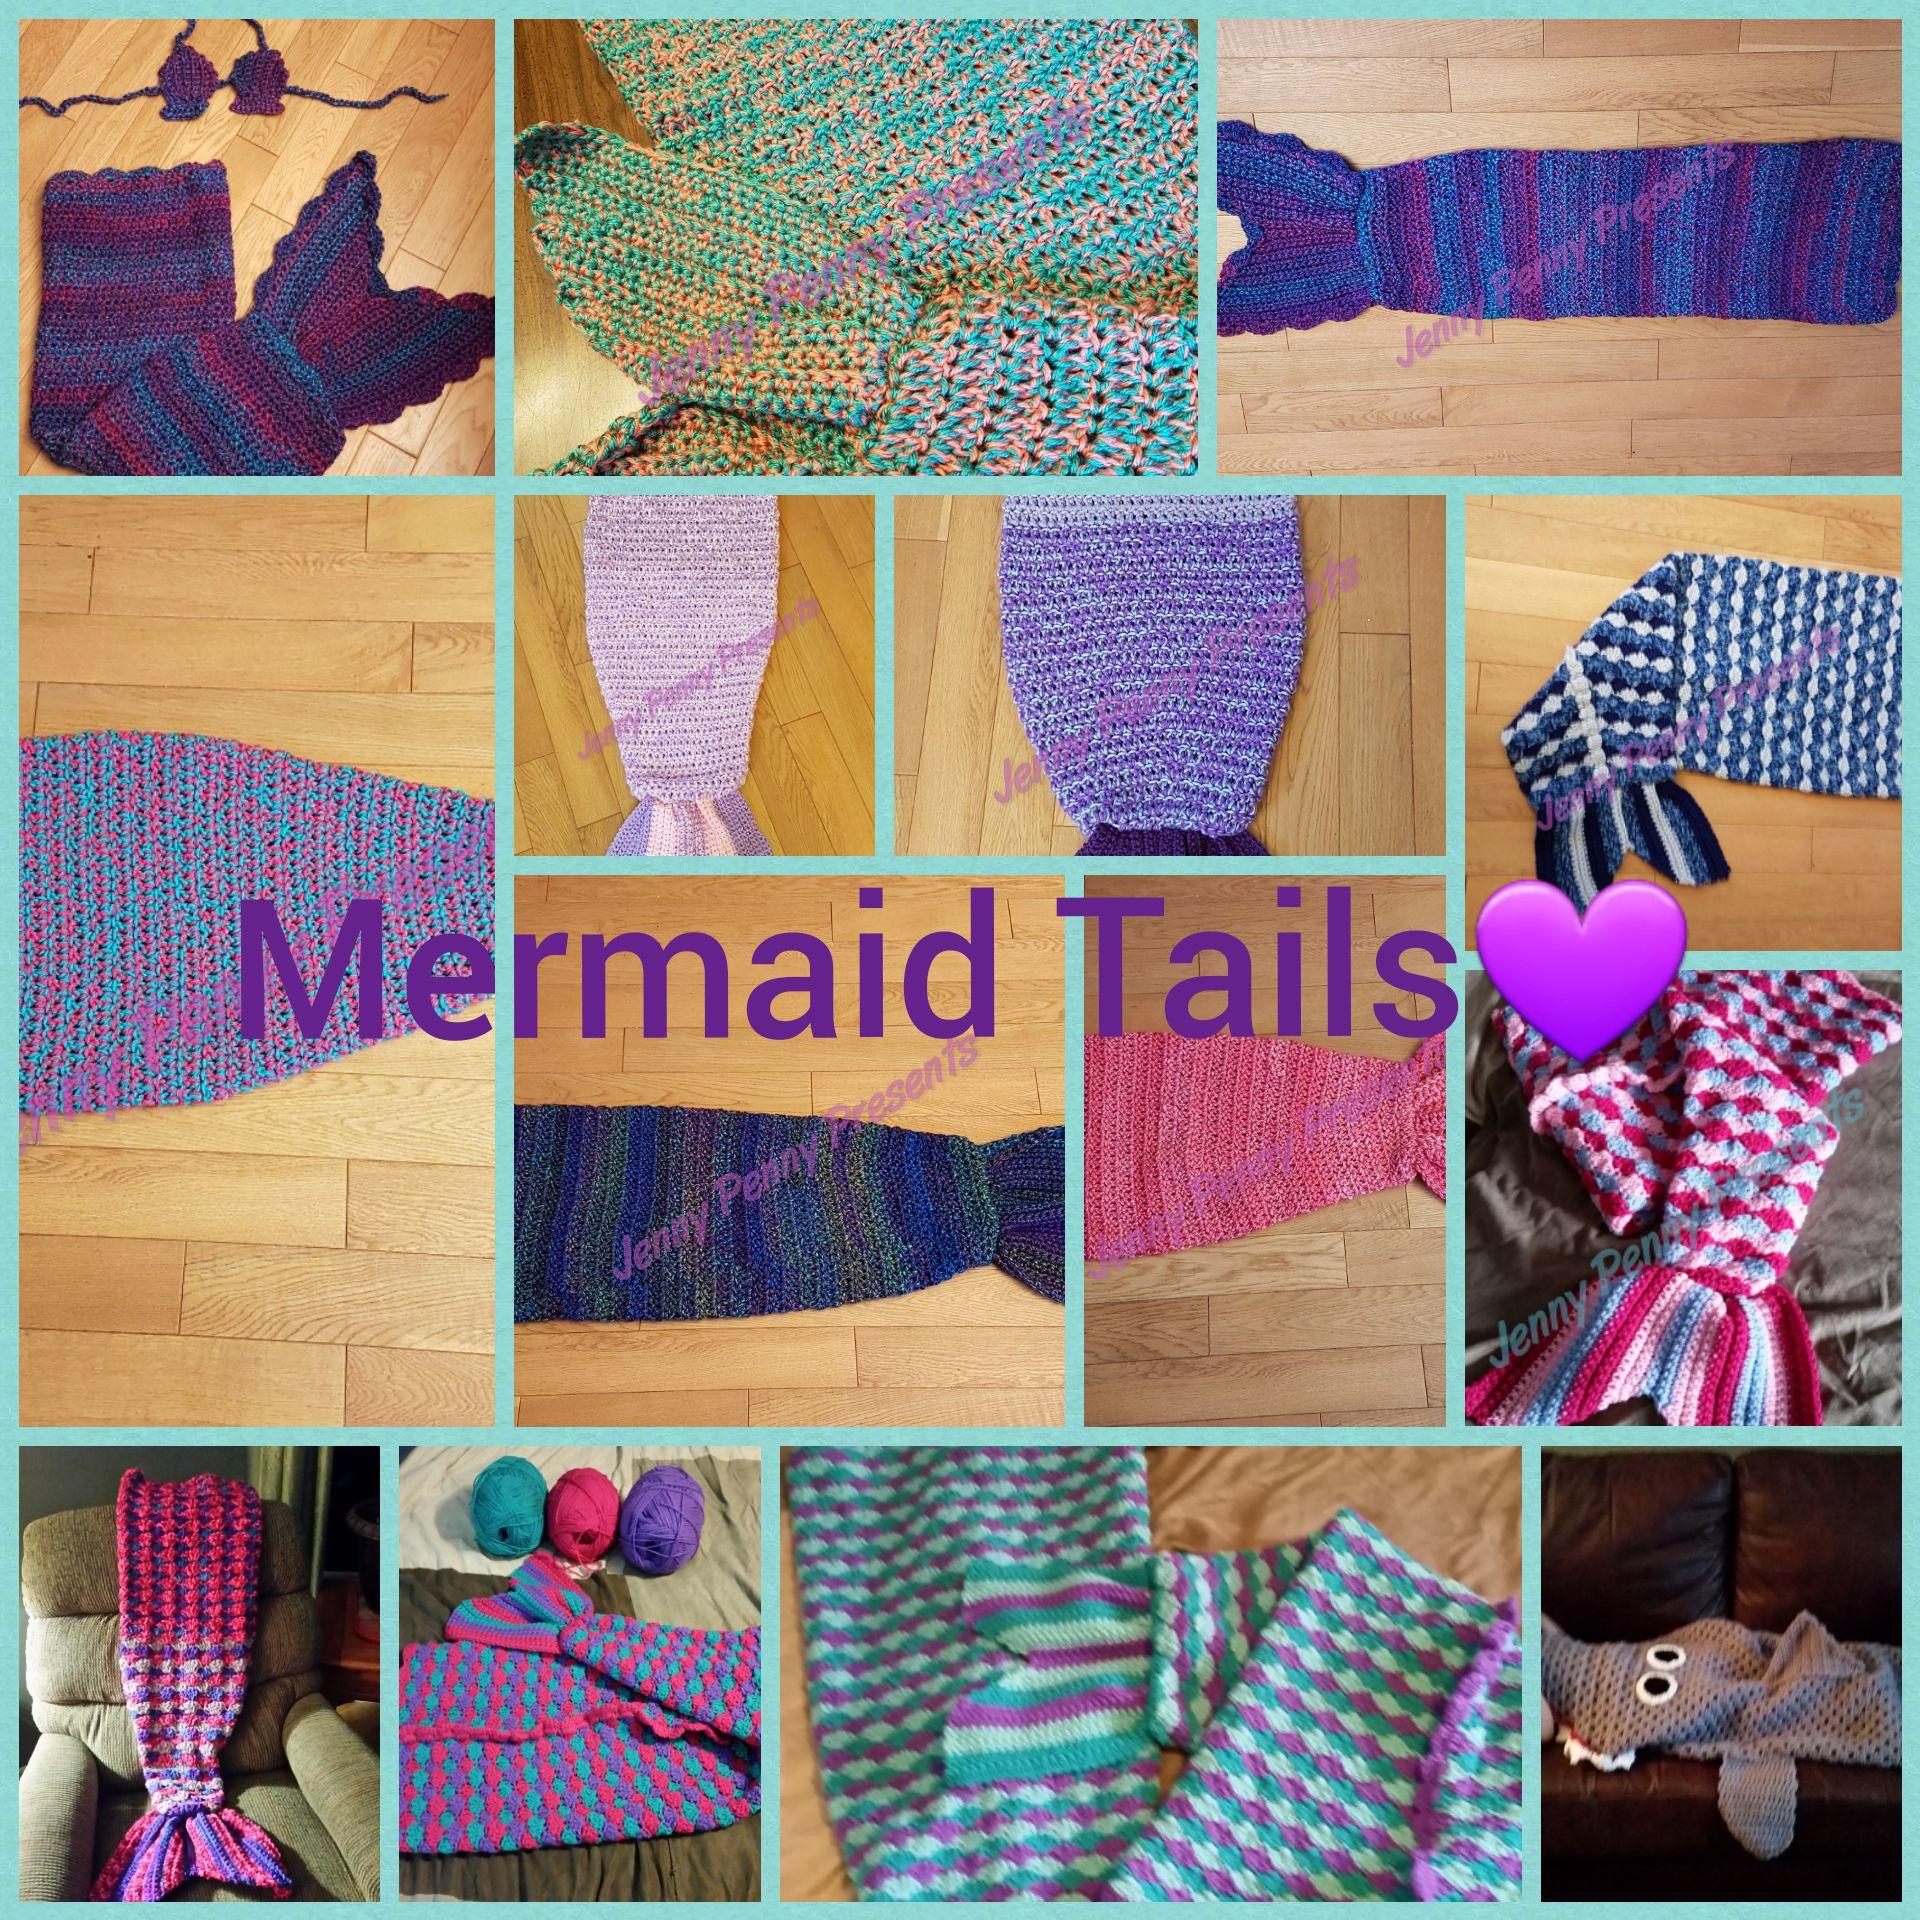 blankets crochet handmade tail mermaid